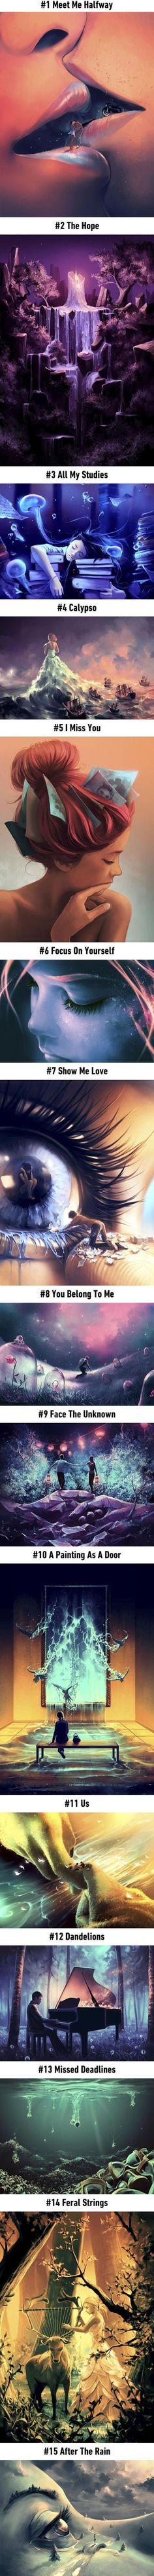 amazing art Artist Creates Surreal Fantasy Universes Inspired By Hayao Miyazaki And Tim Burton (By Ciryl Rolando) Art Photography, Street Photography, Wow Art, Hayao Miyazaki, Cool Drawings, Interesting Drawings, Random Drawings, Unique Drawings, Amazing Drawings